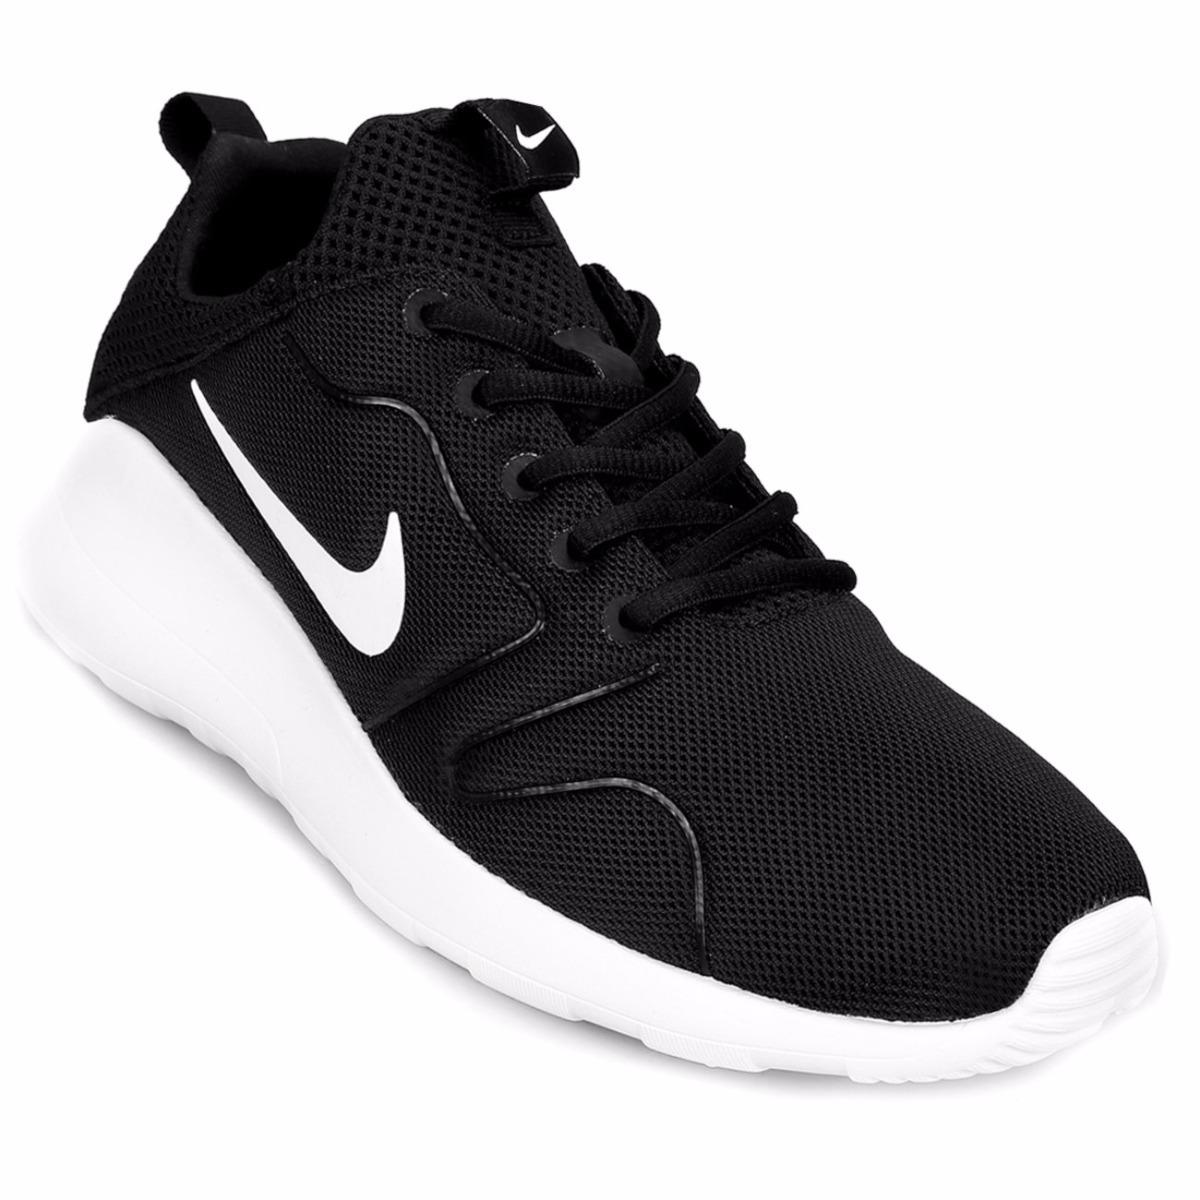 En 0 Kaishi 05 266 2 3 Zapatillas Nike Originales Hombre vgzxAtw